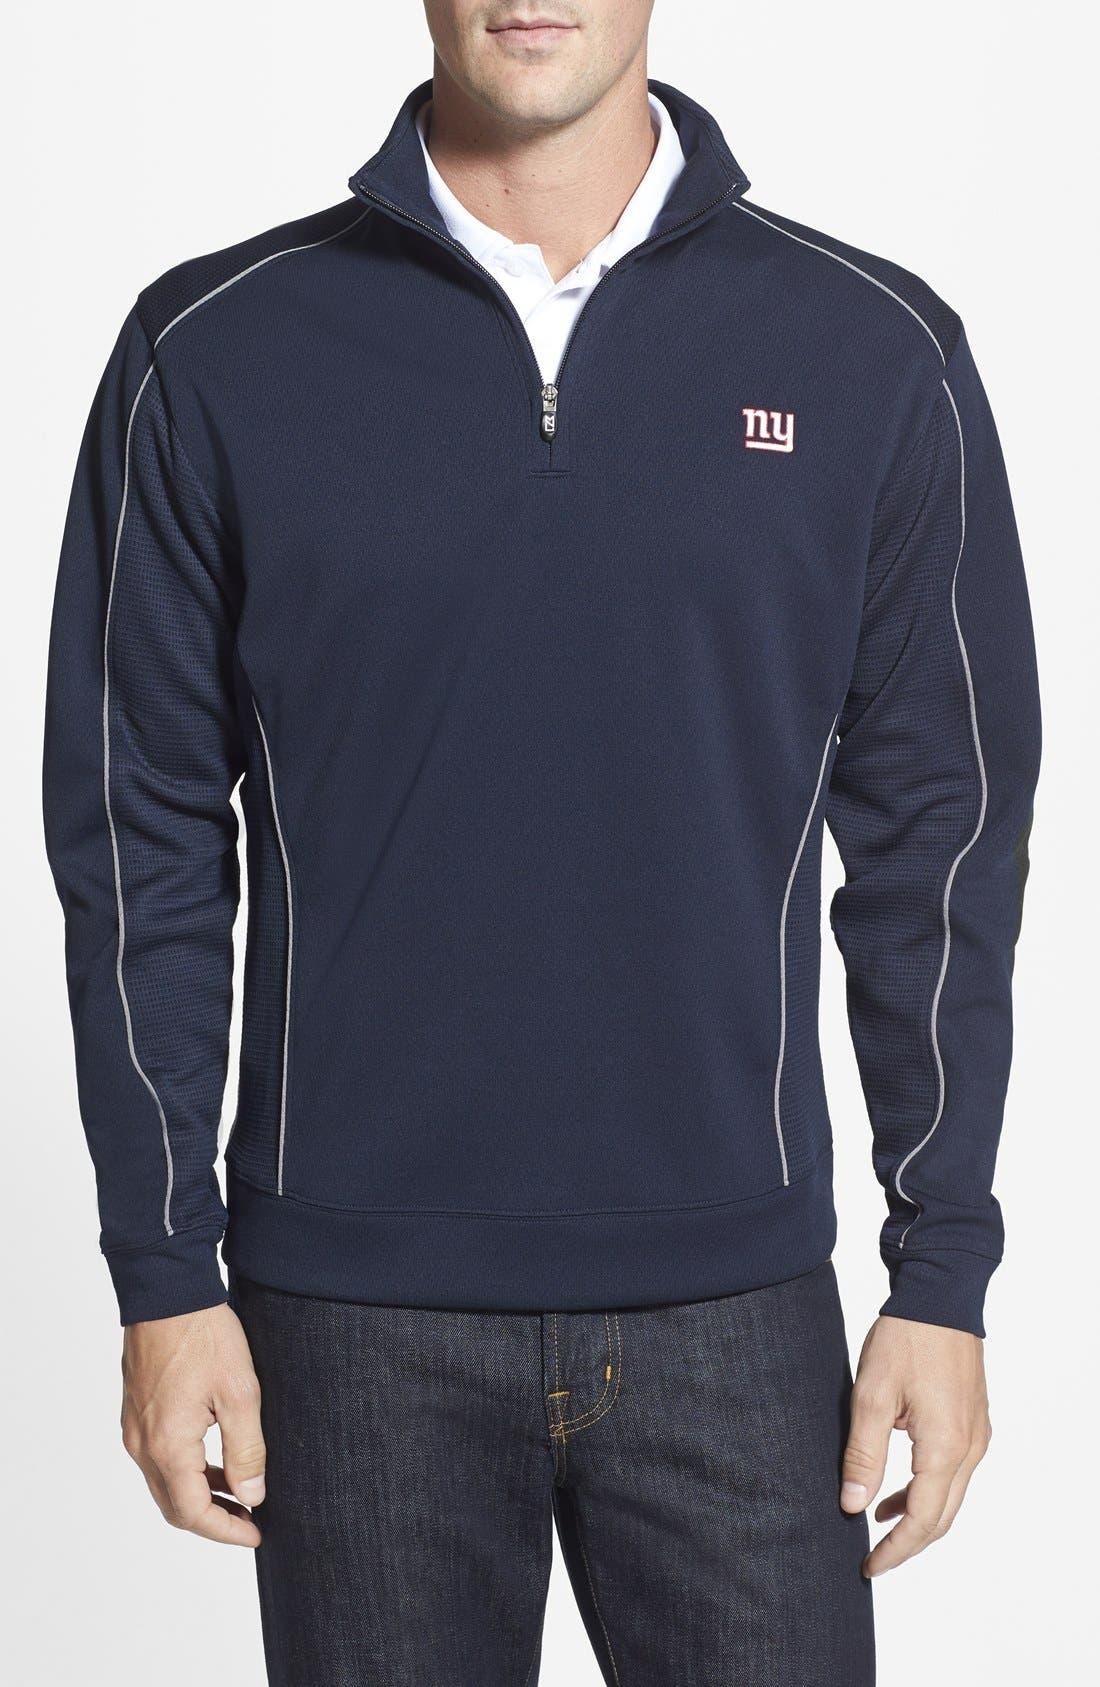 New York Giants - Edge DryTec Moisture Wicking Half Zip Pullover,                             Main thumbnail 1, color,                             420